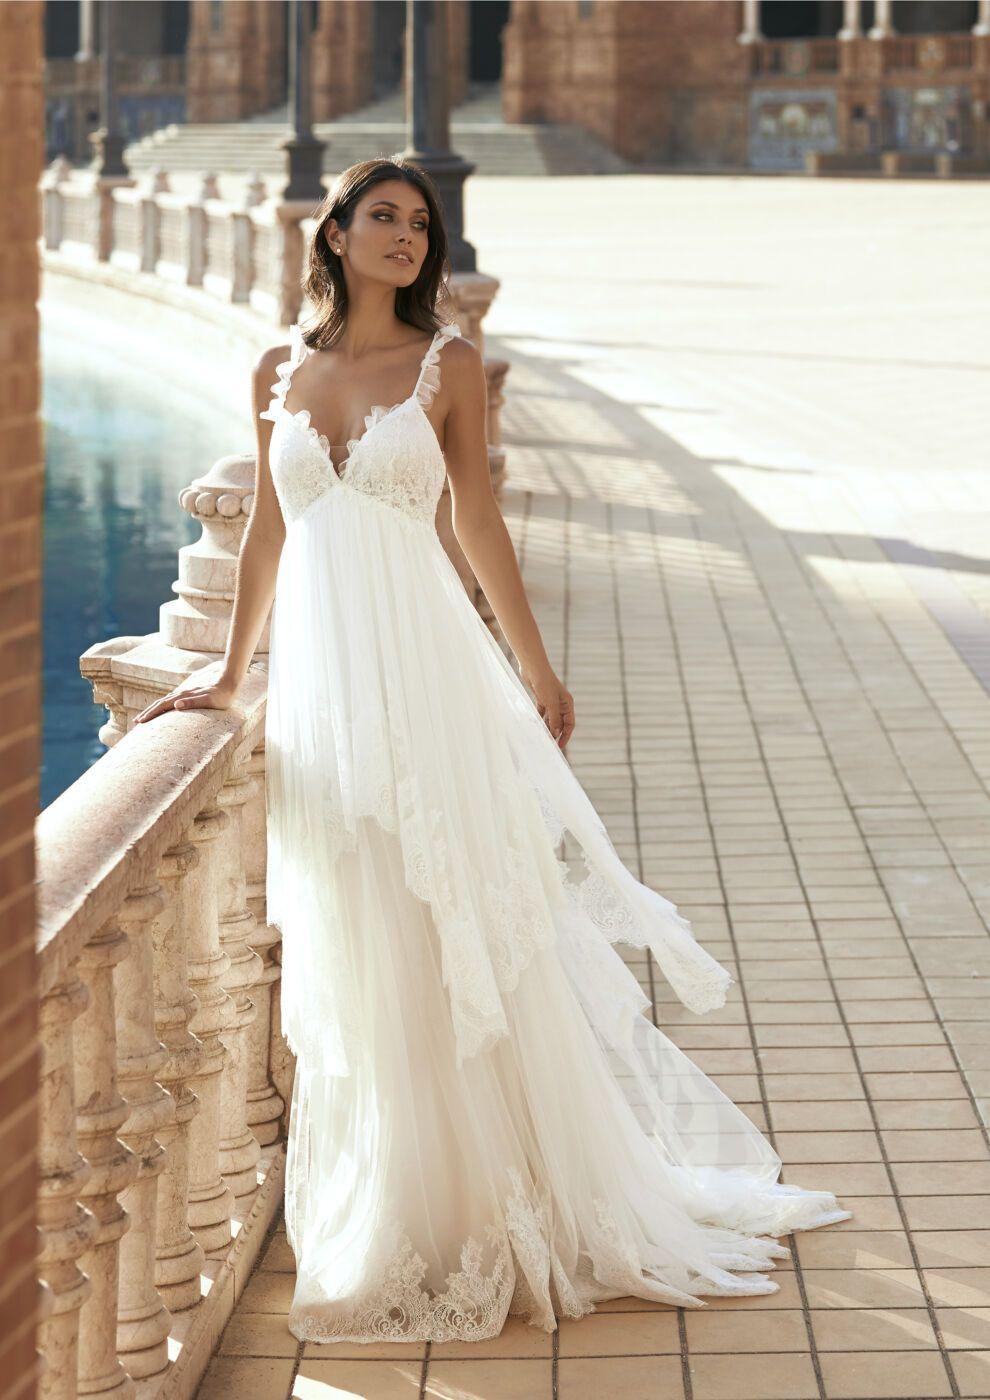 https://www.weddingmagazine.com.ua/wp-content/uploads/2021/03/caneta-b.jpg